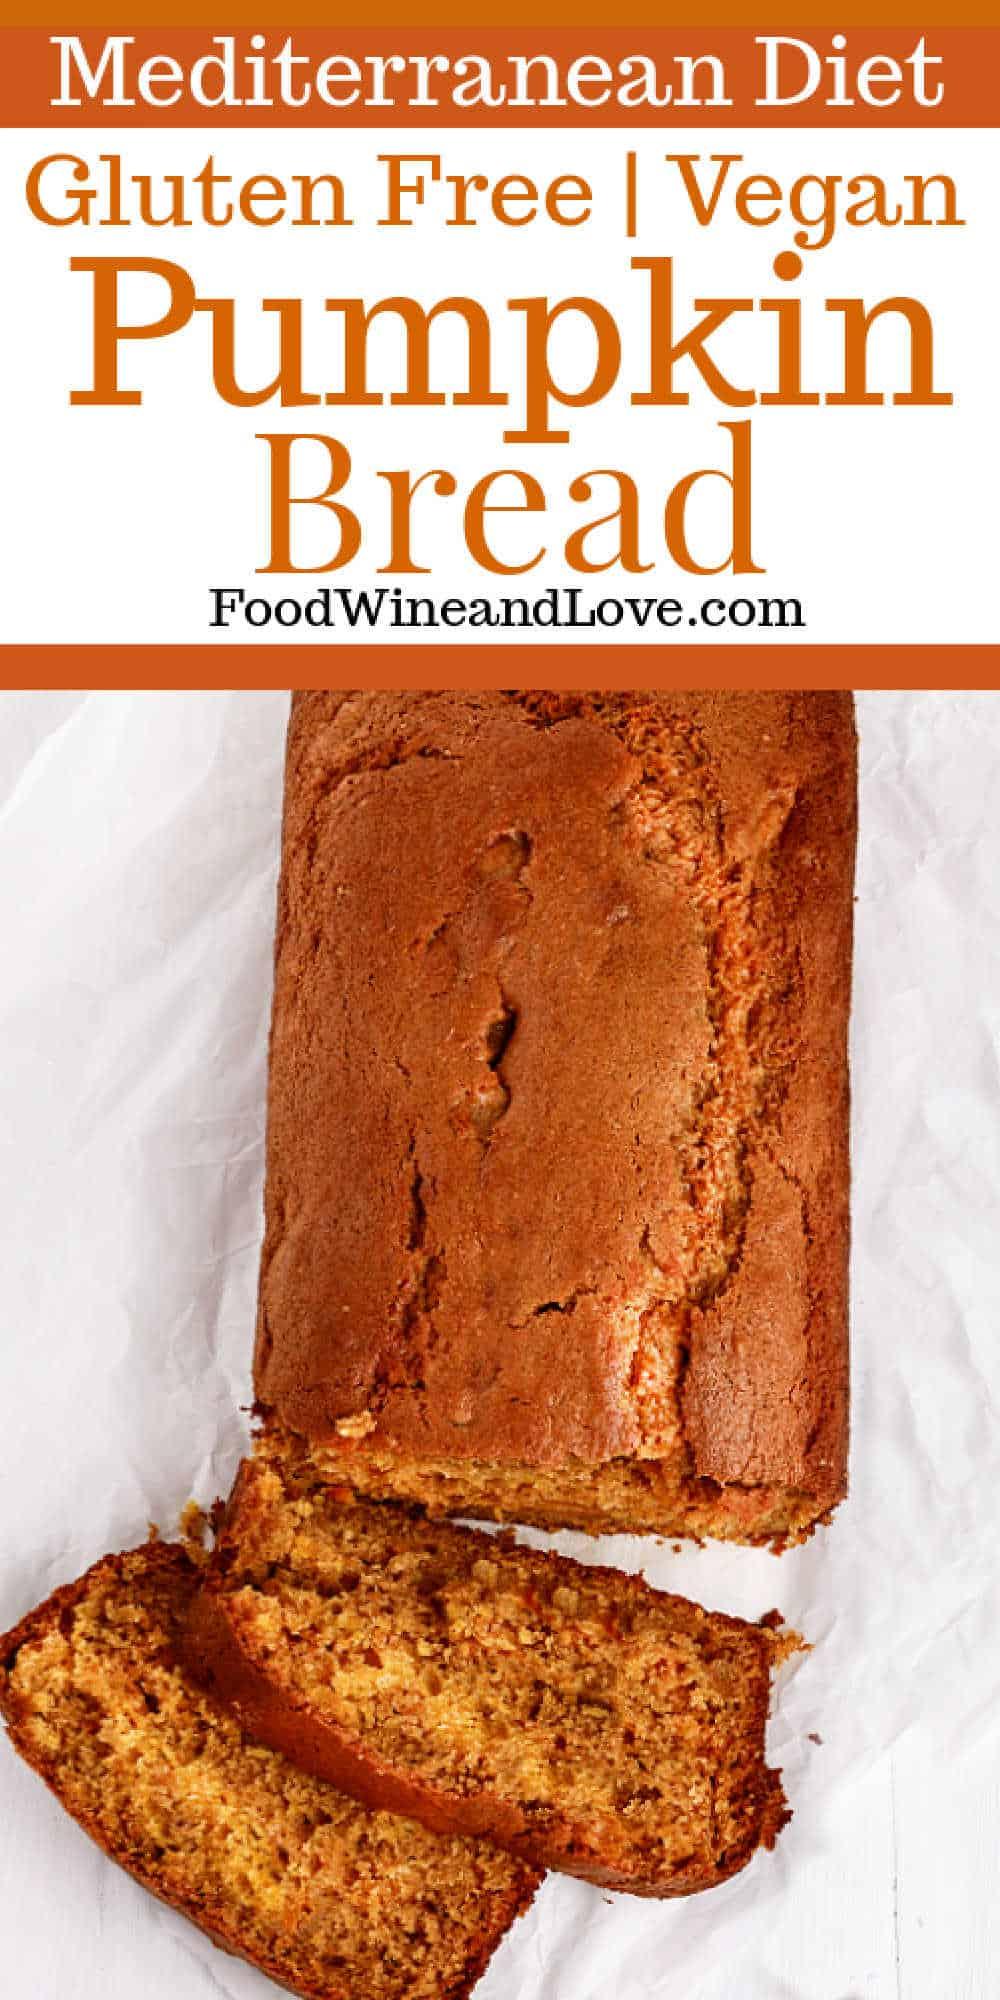 Vegan and Gluten Free Pumpkin Bread